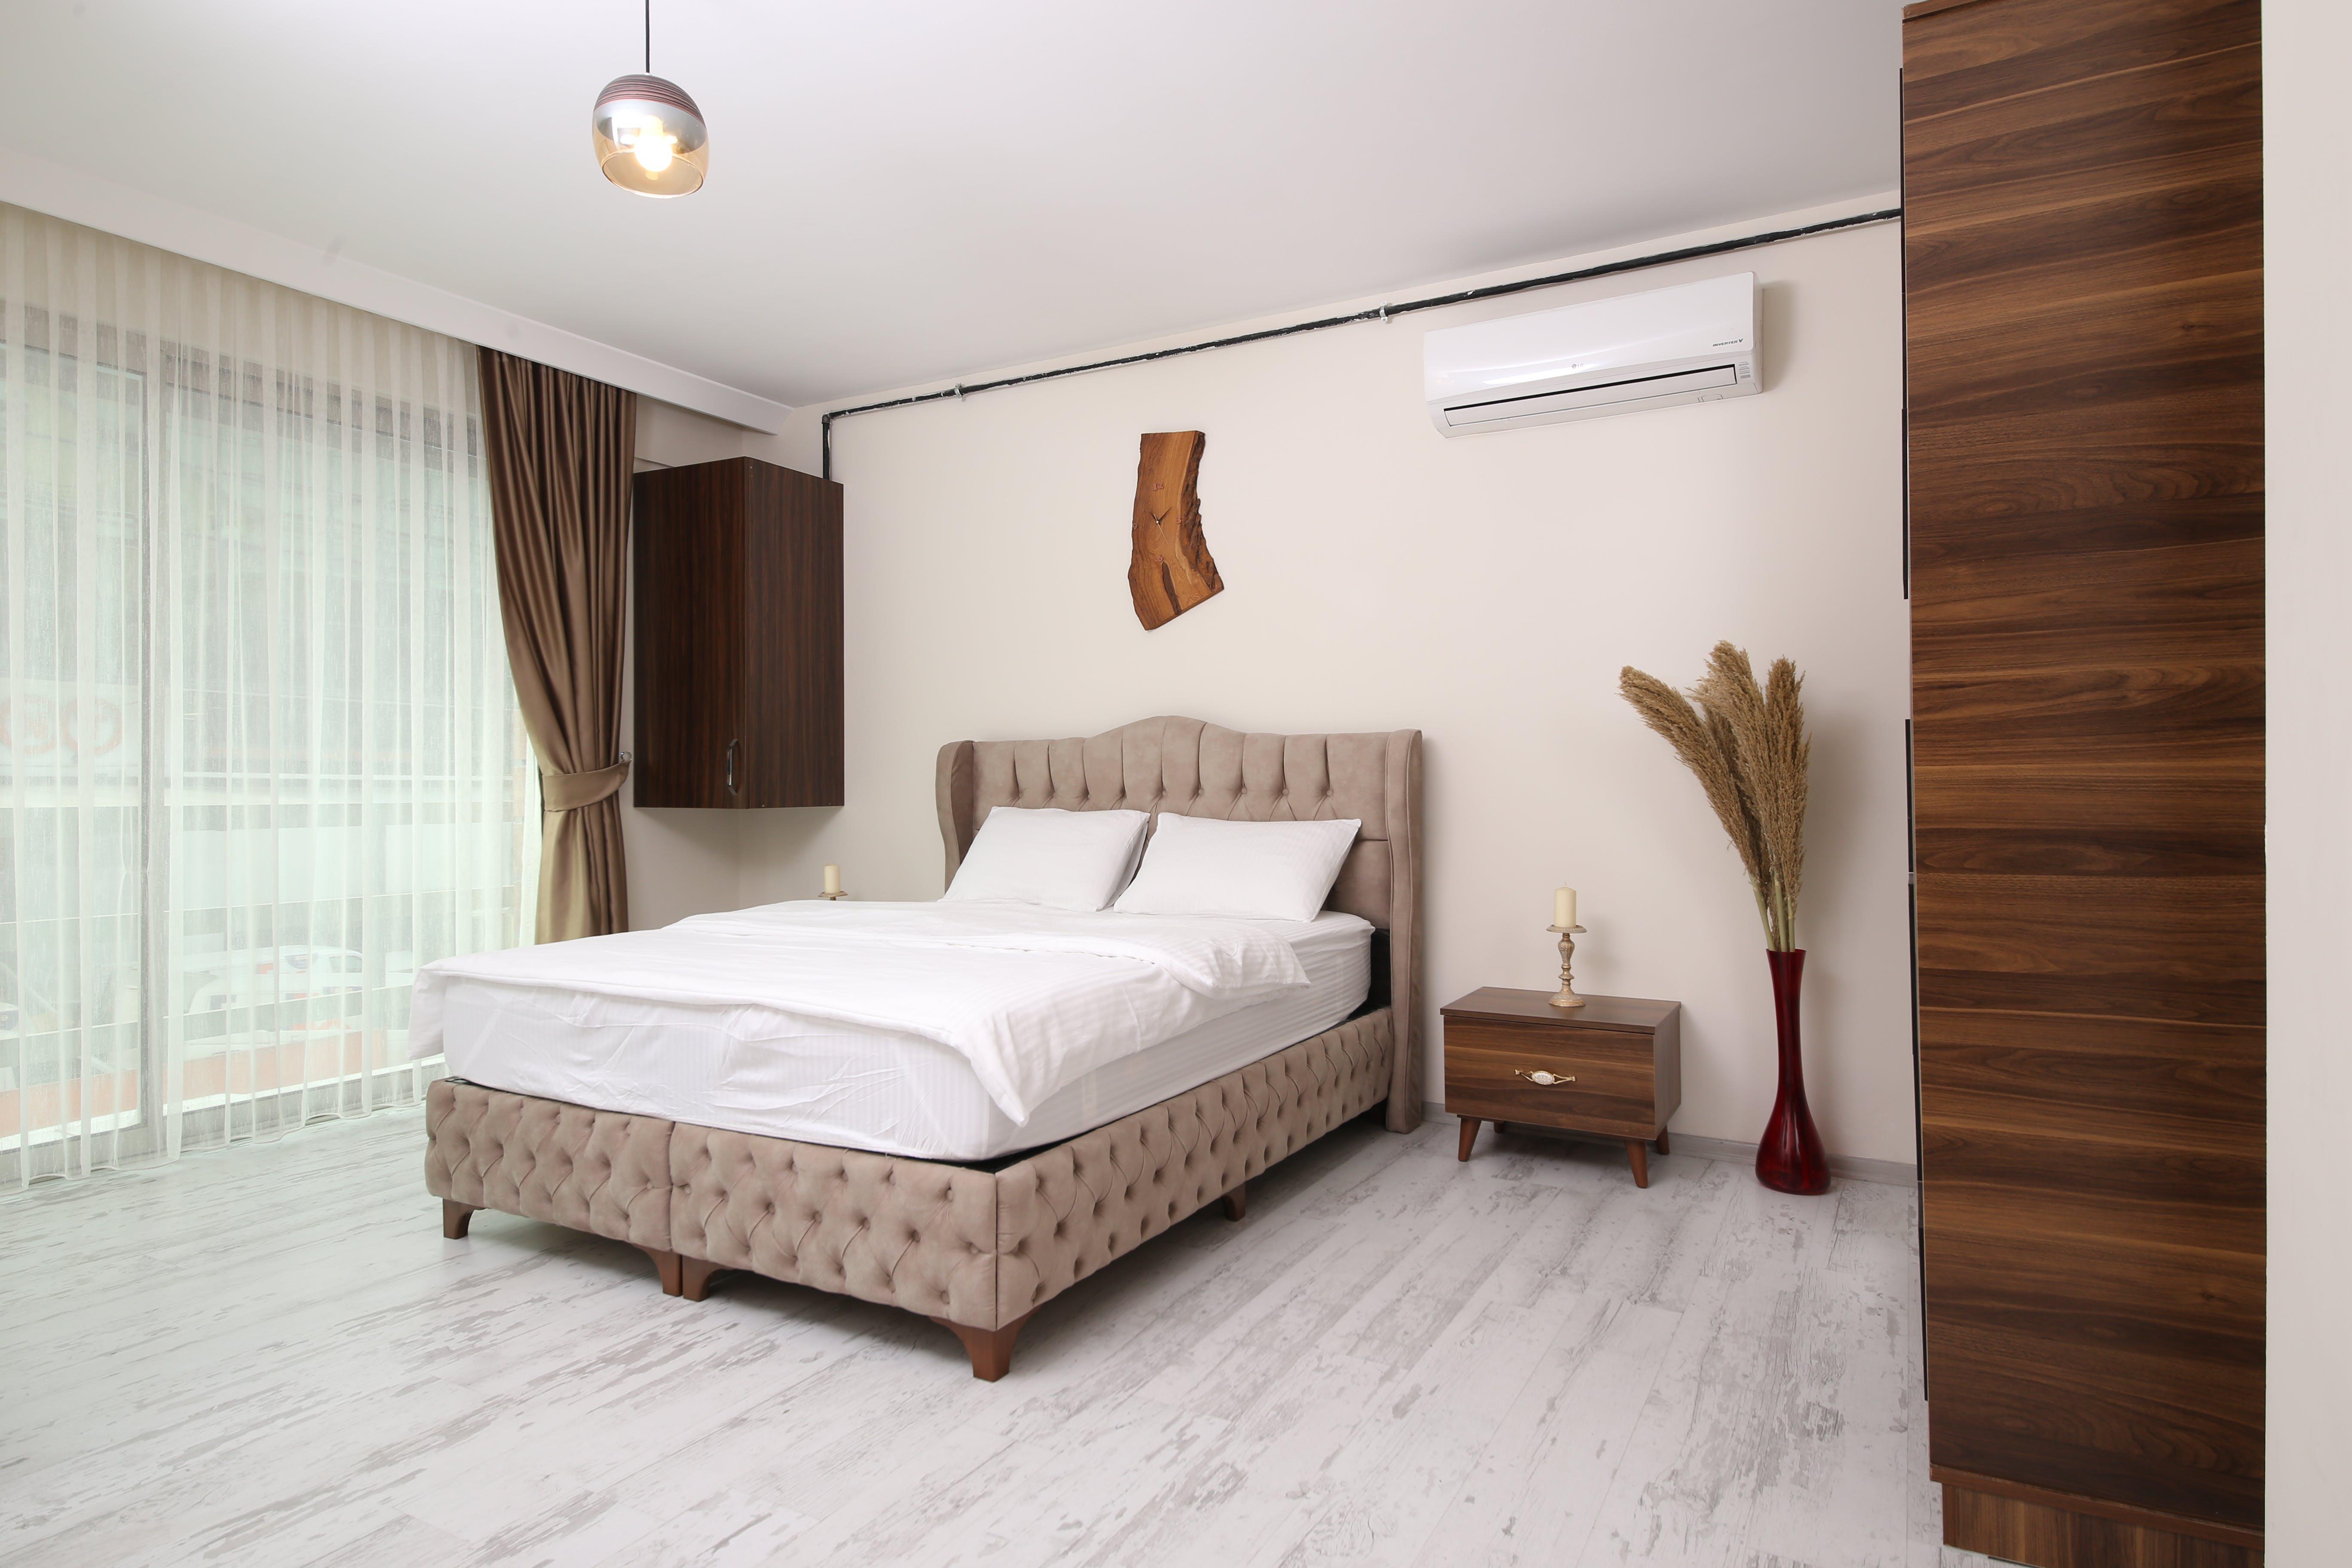 A Simple Bedroom